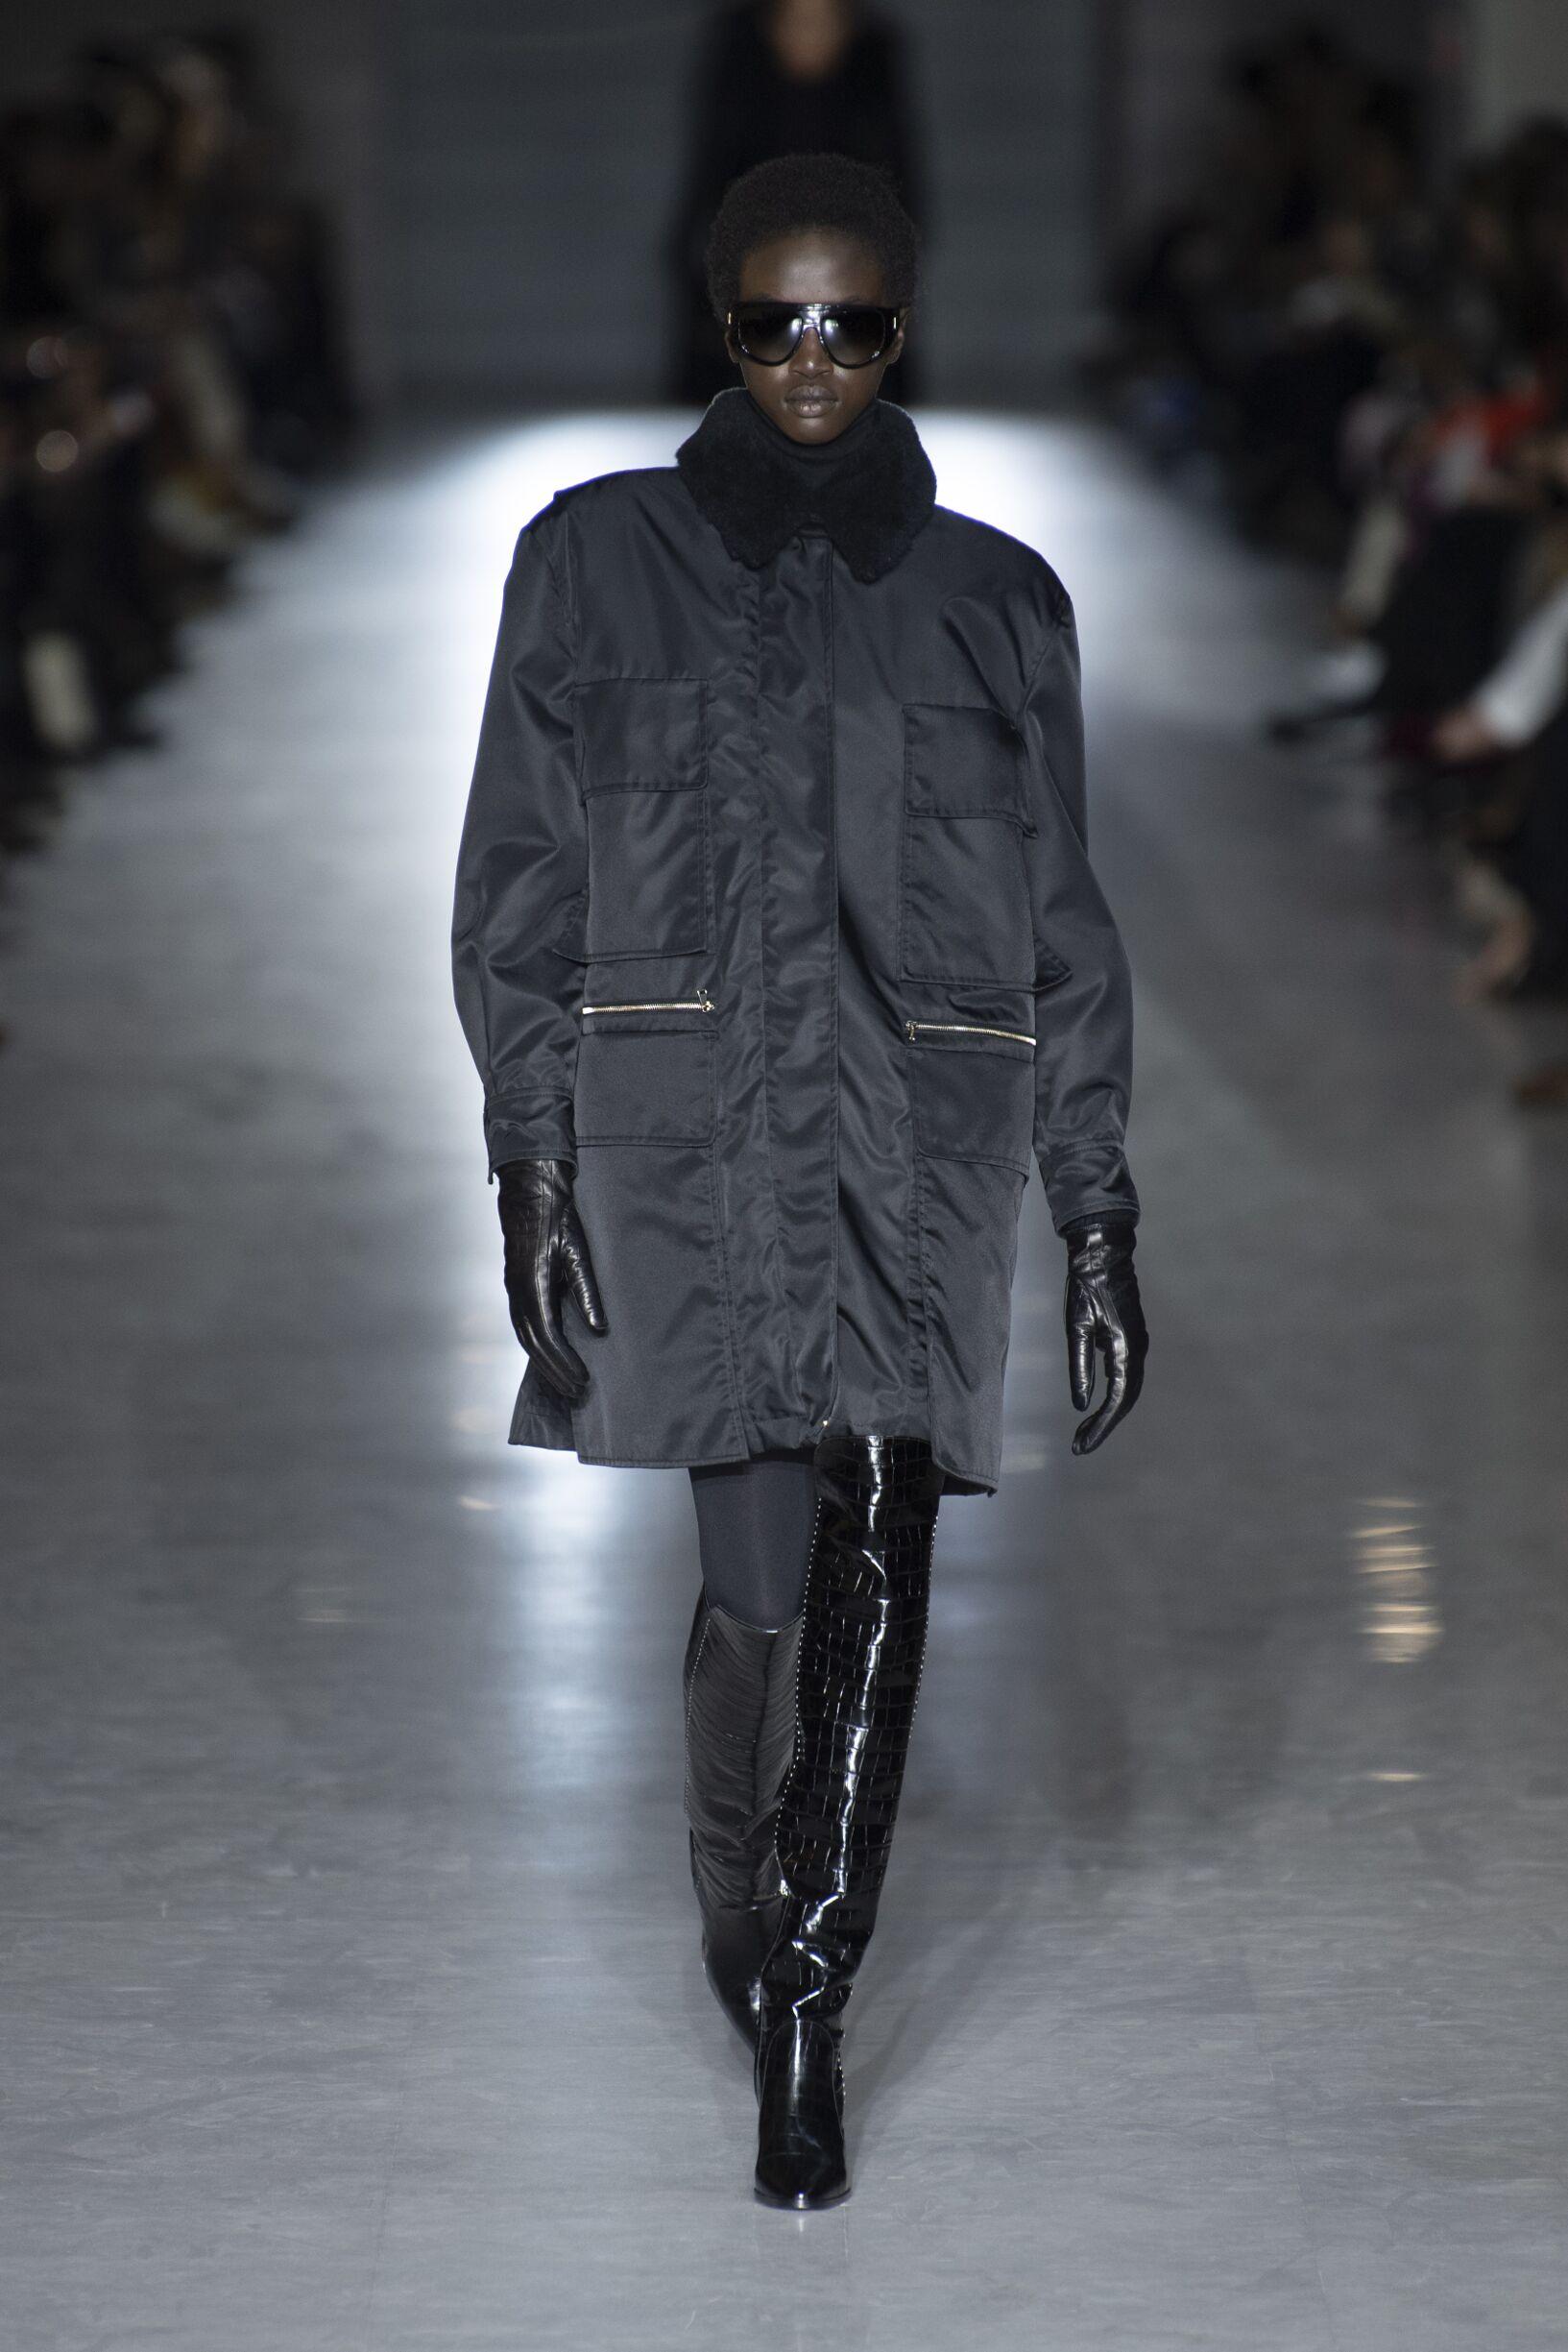 Max Mara Milan Fashion Week Womenswear 2019-20